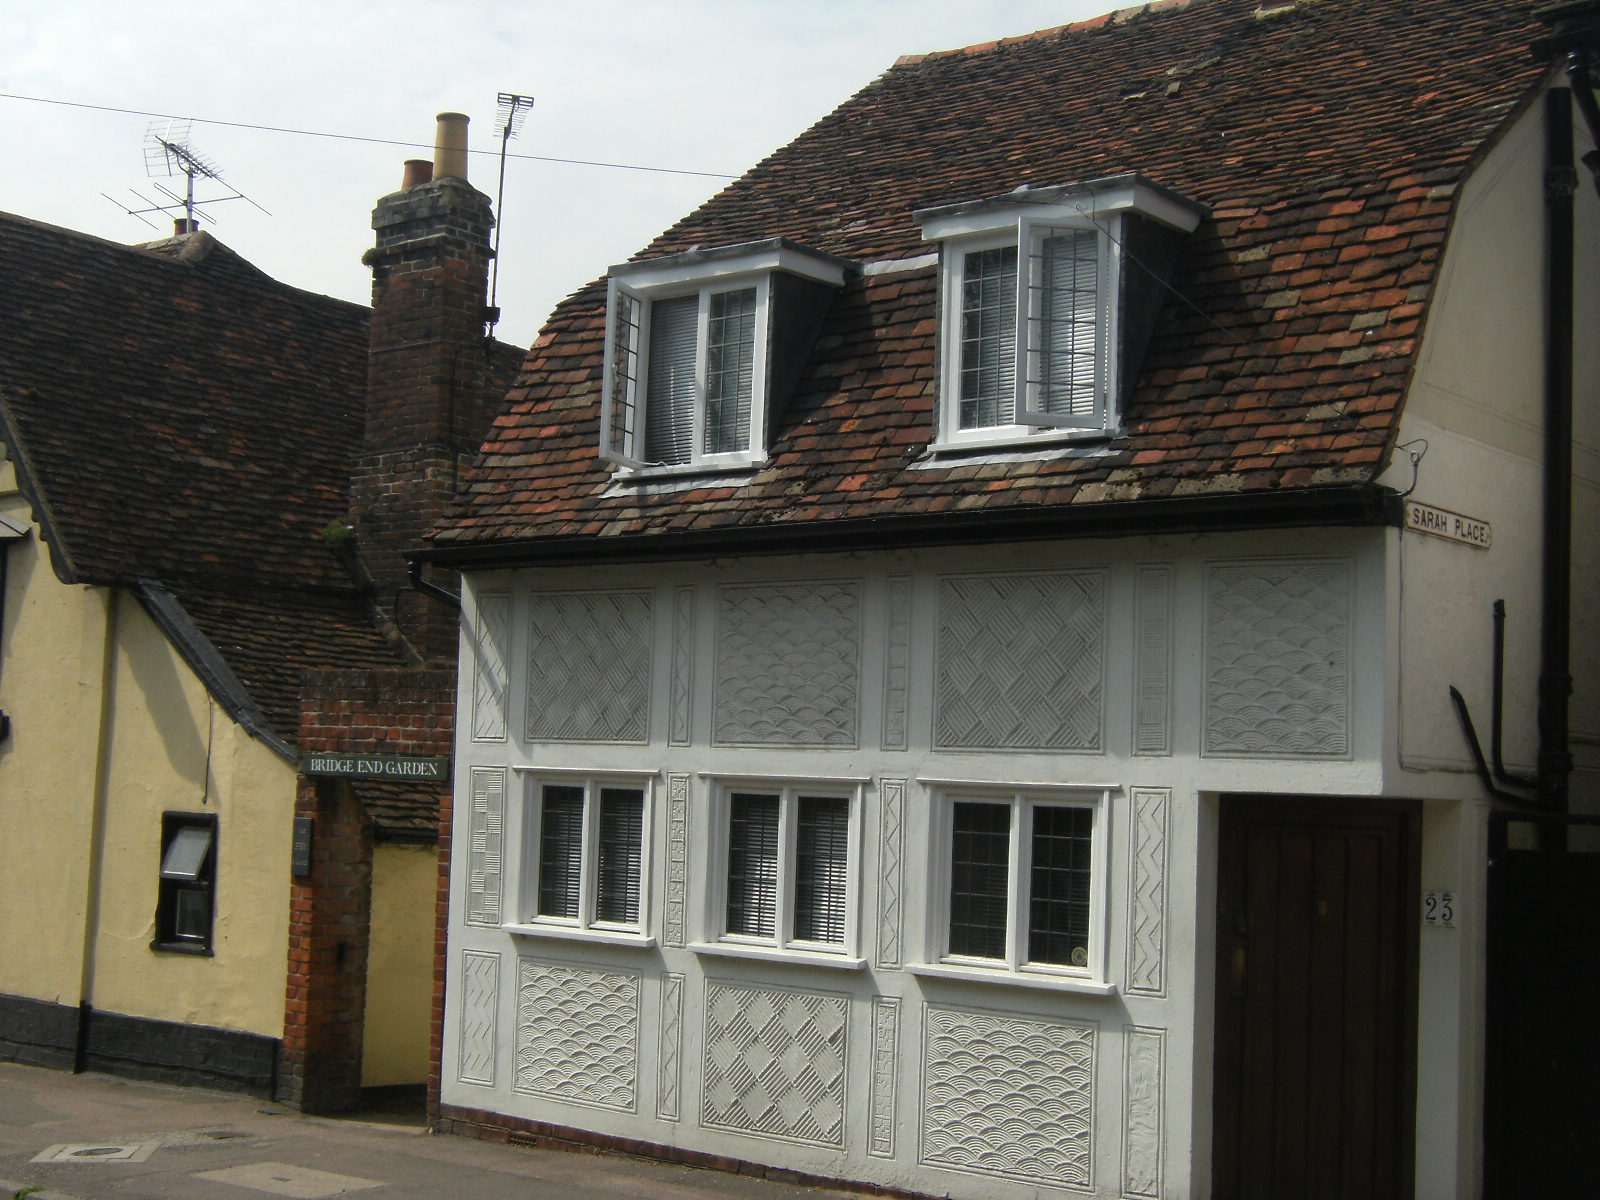 DSCF9017 House with pargeting in Castle Street, Saffron Walden